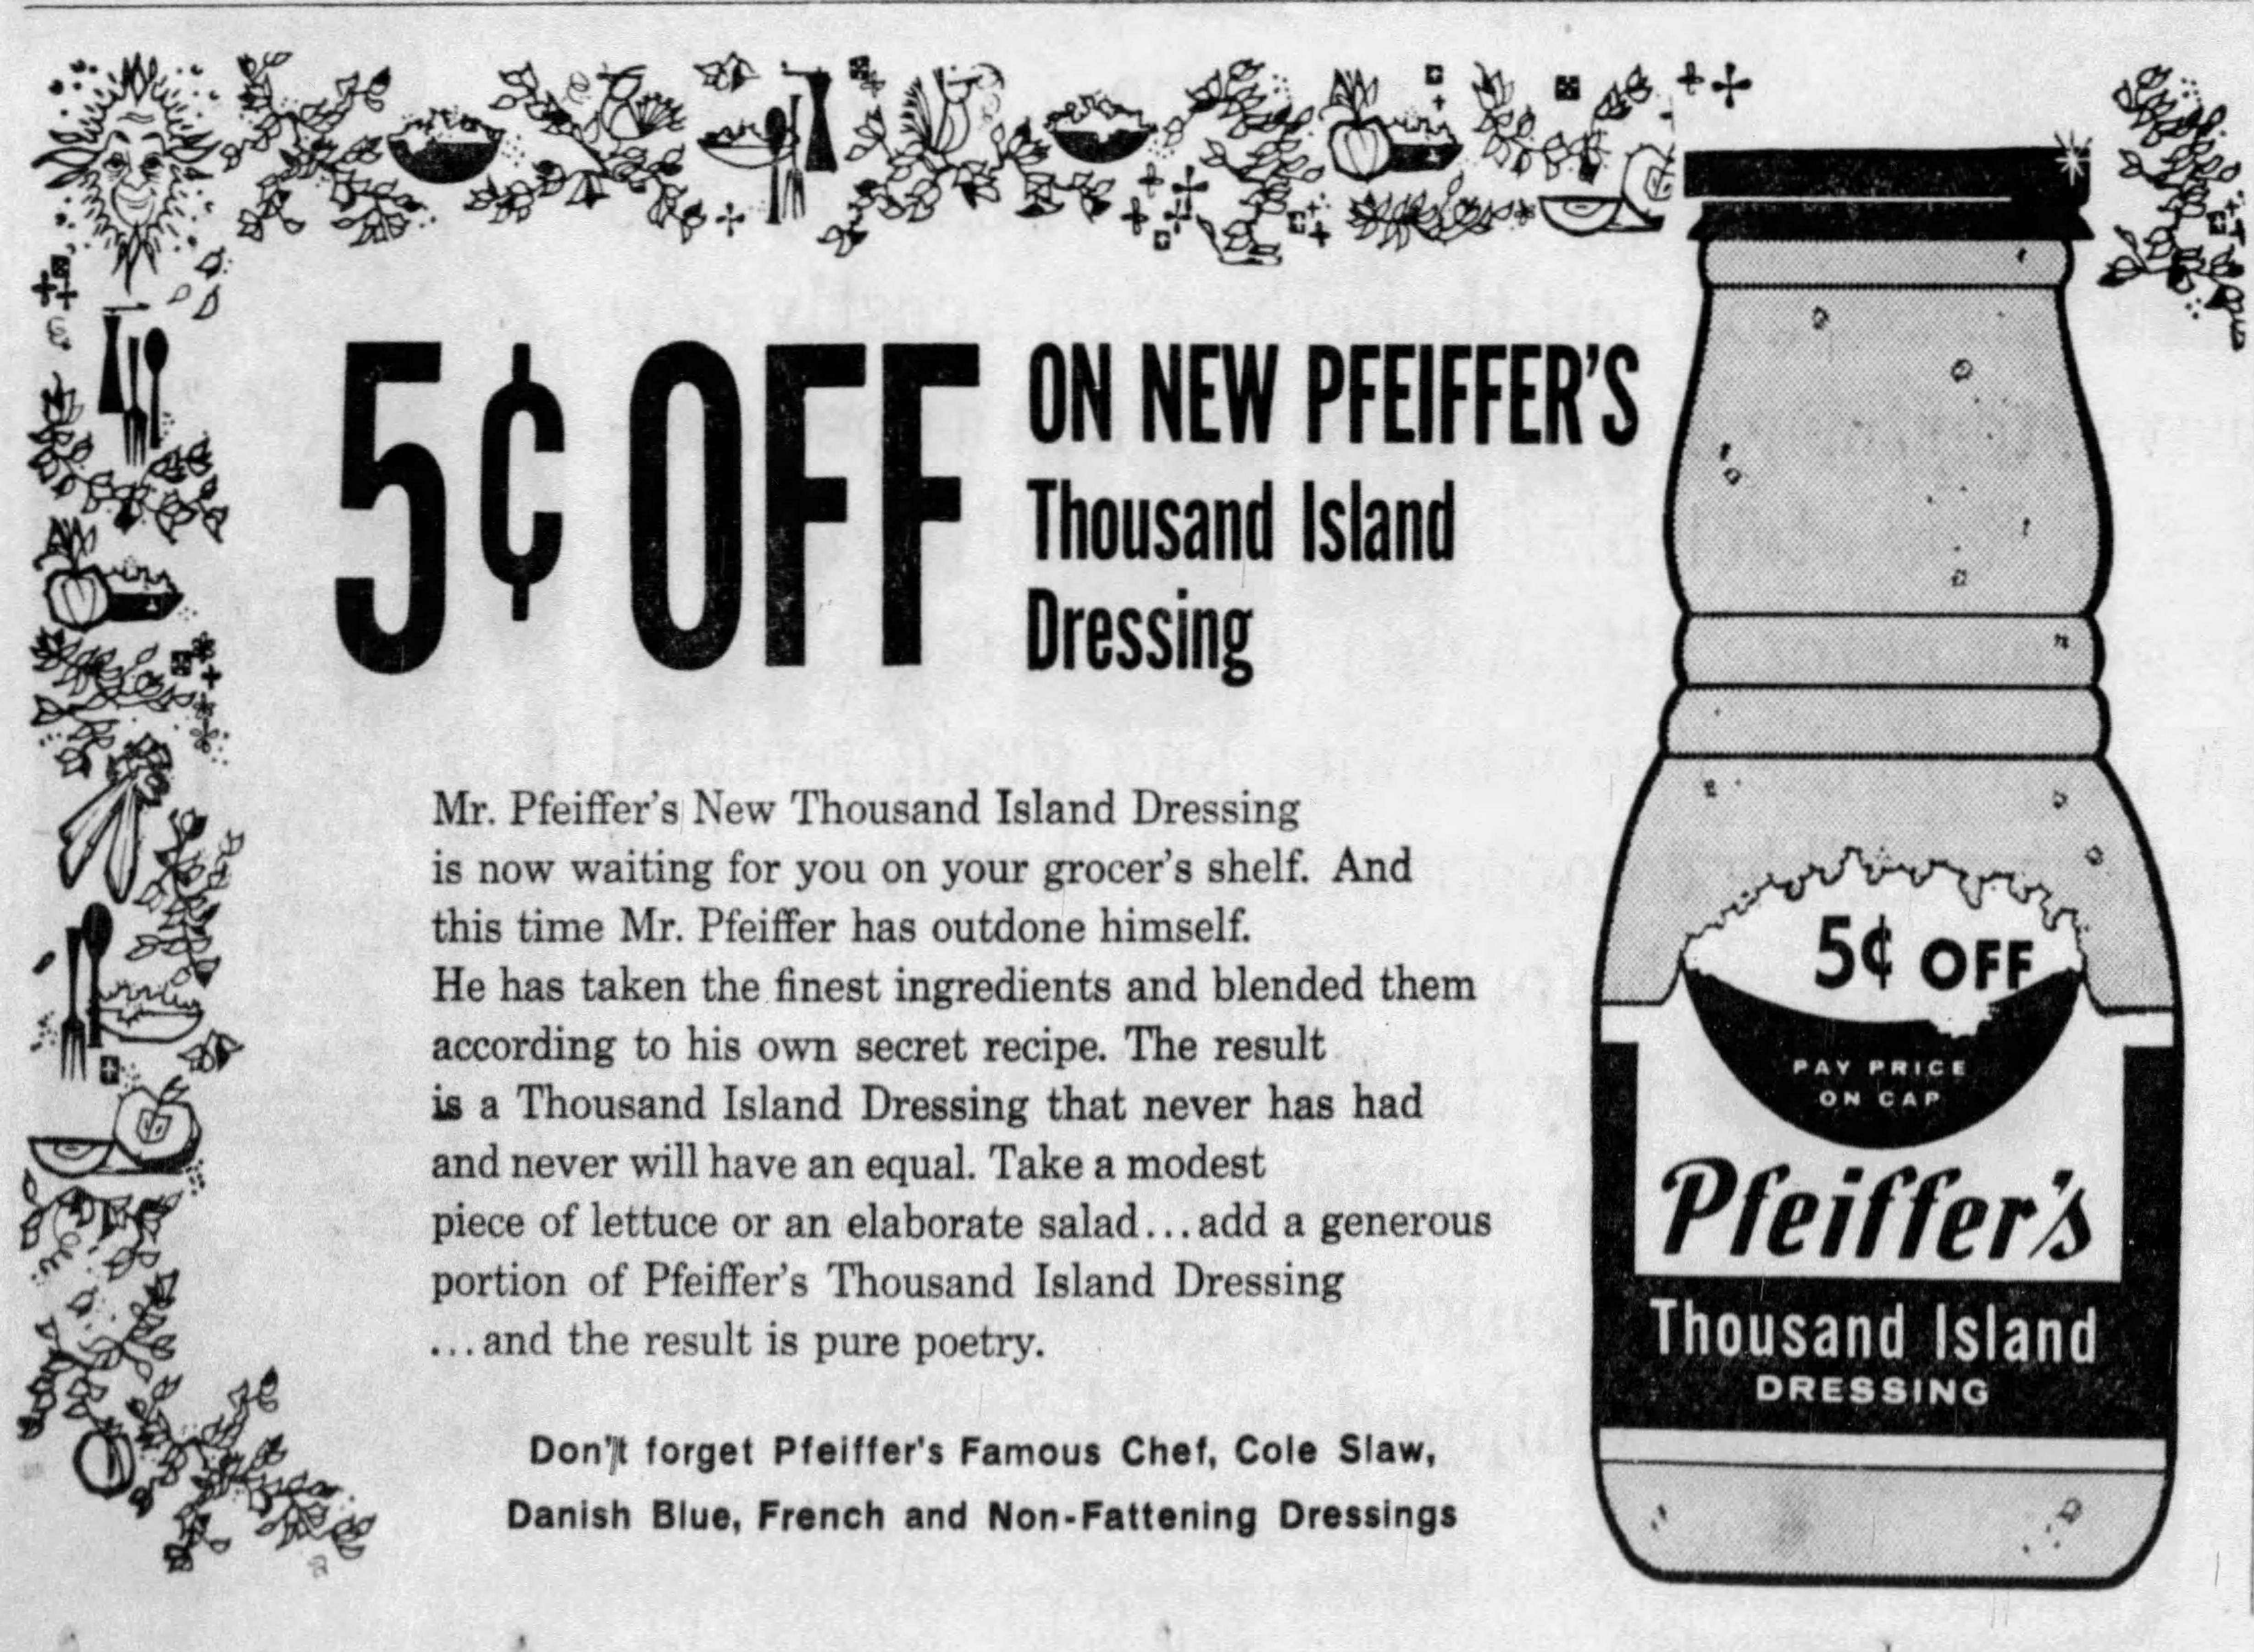 1961Pfeiffer'sThousandIslandDressingAd